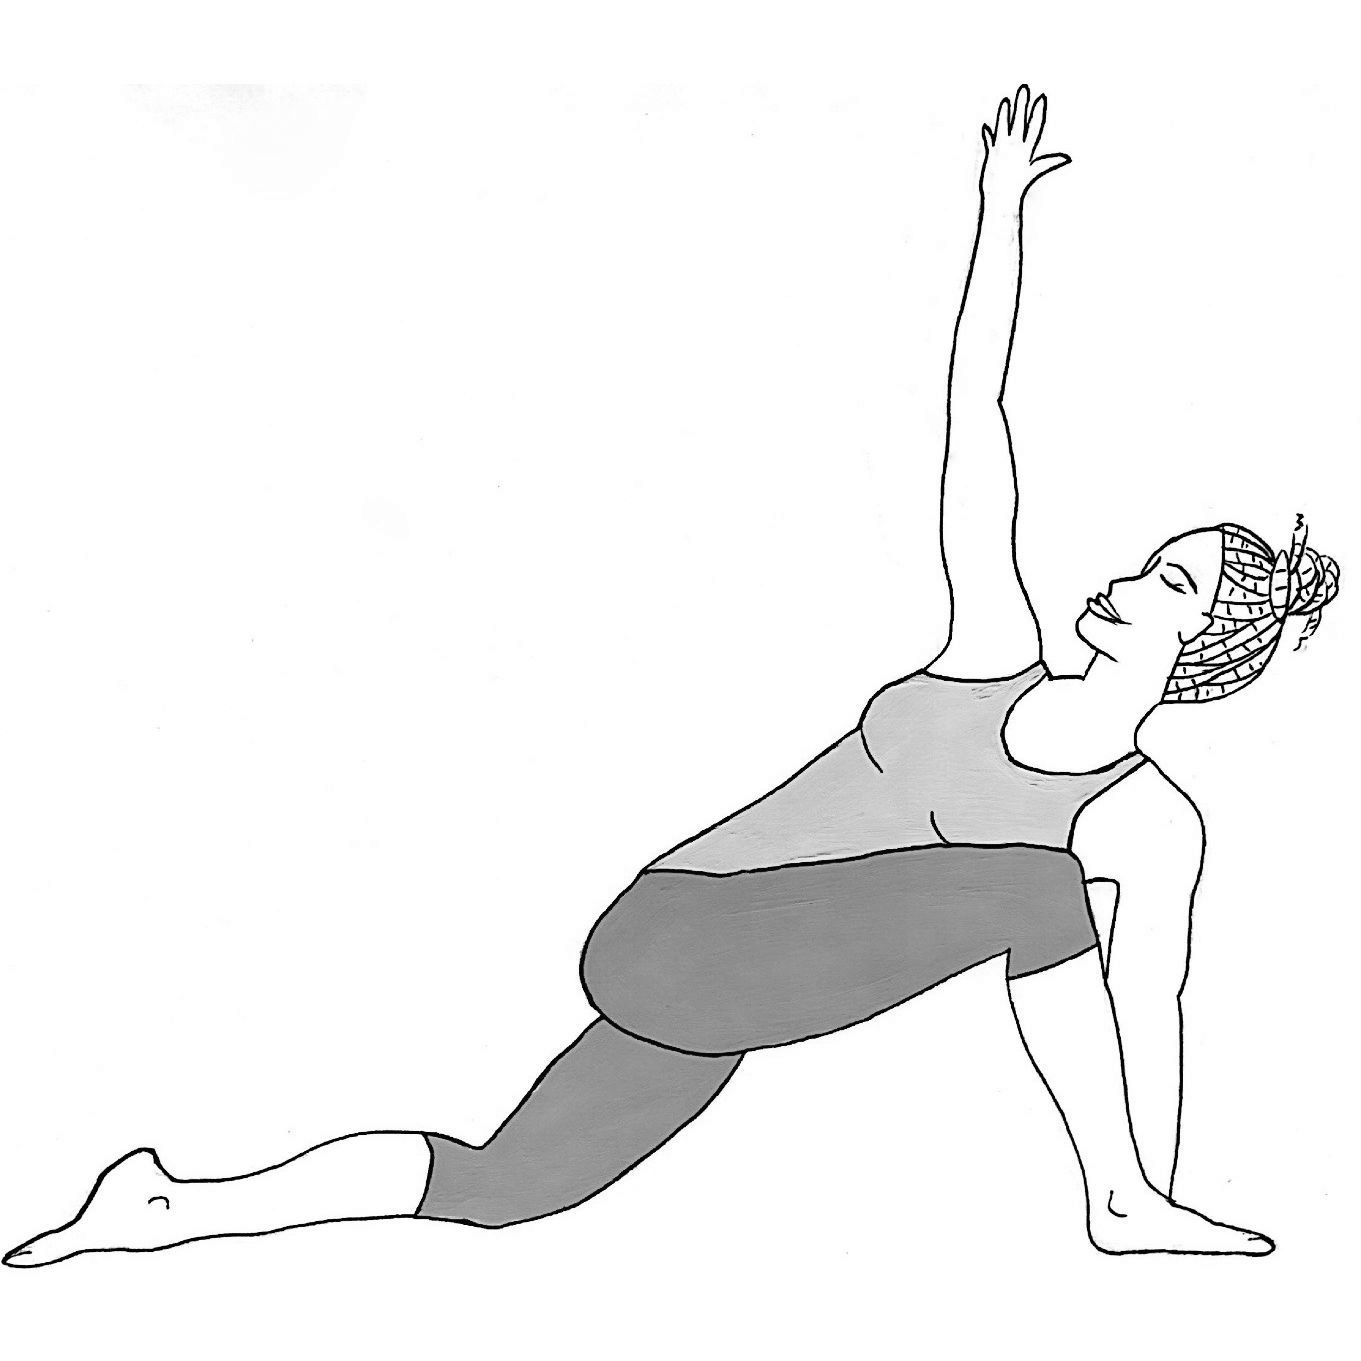 Revolved Low Lunge - Parivritta Anjaneyasana